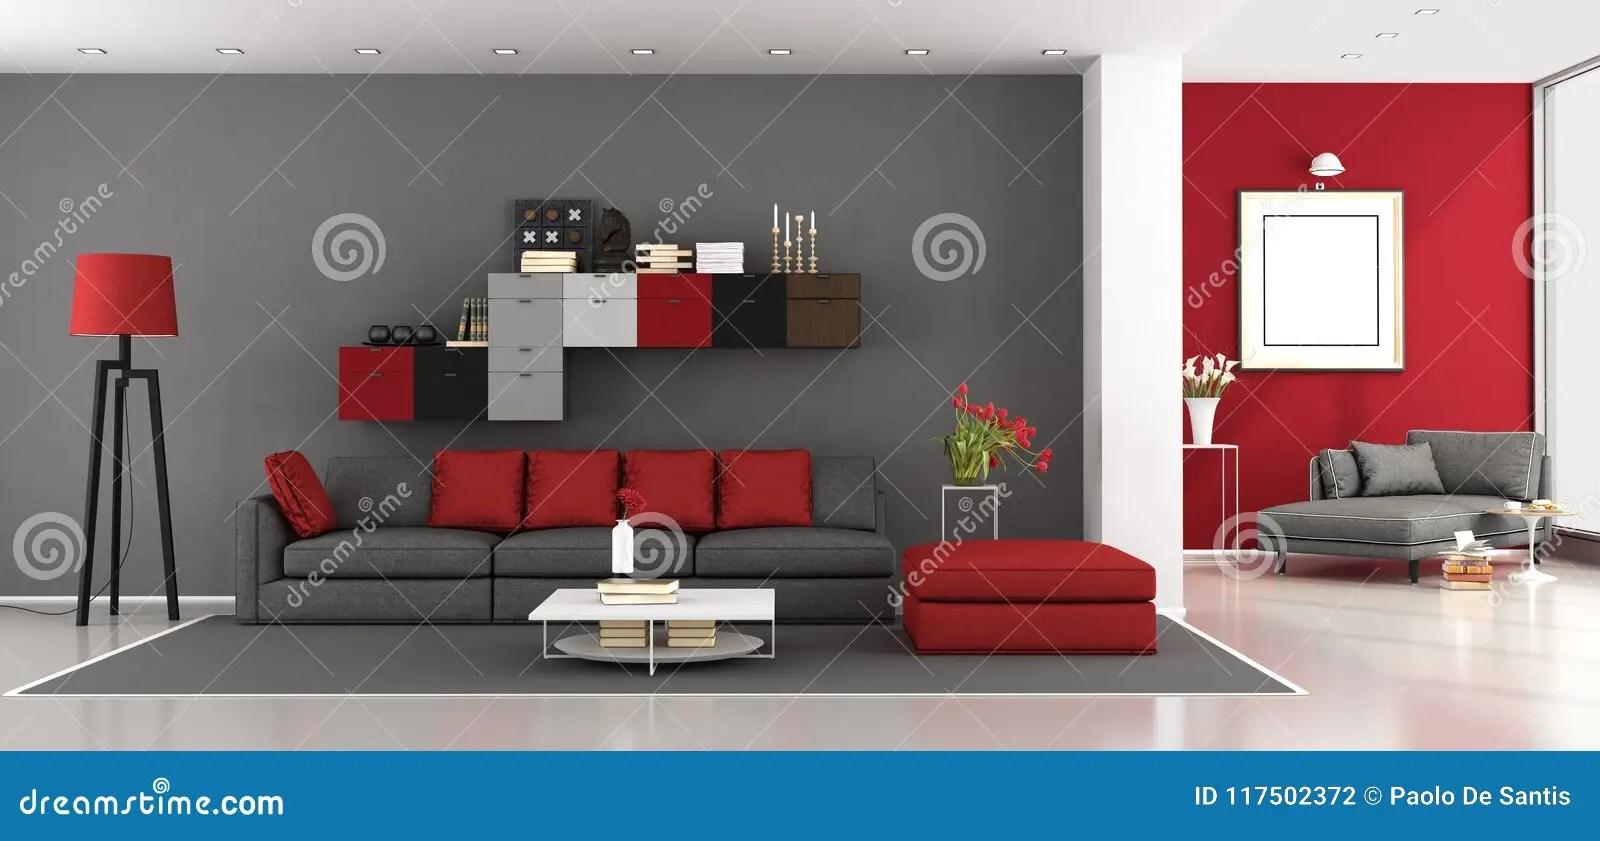 https www dreamstime com red gray modern living room red gray modern living room sofa chaise lounge background d rendering image117502372